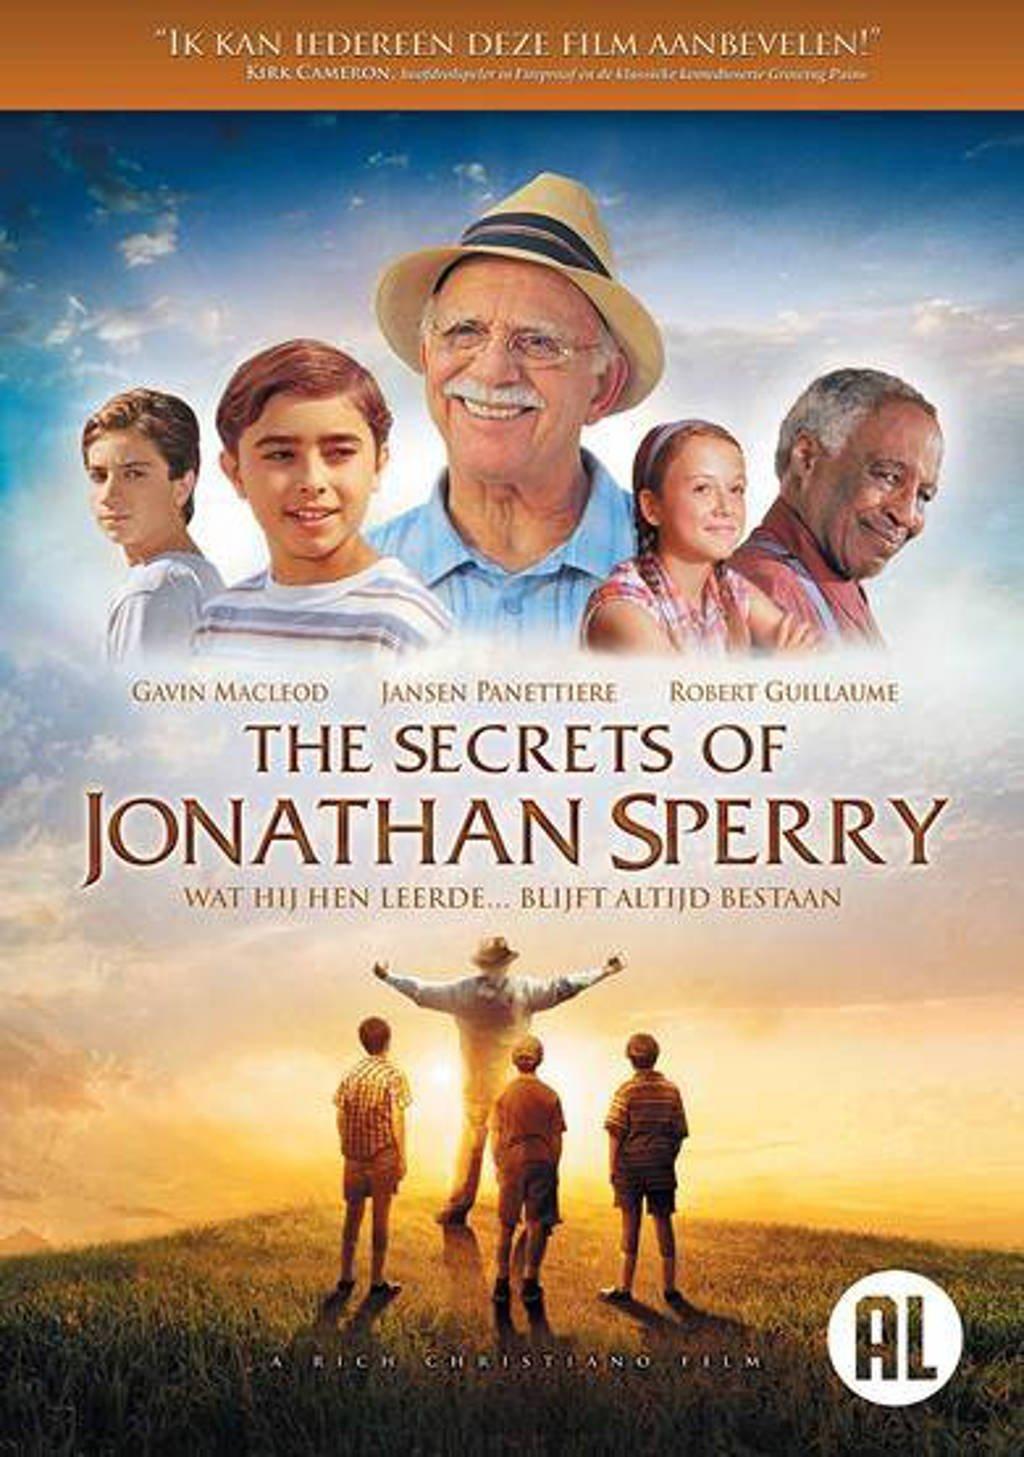 Secrets of Jonathan Sperry (DVD)